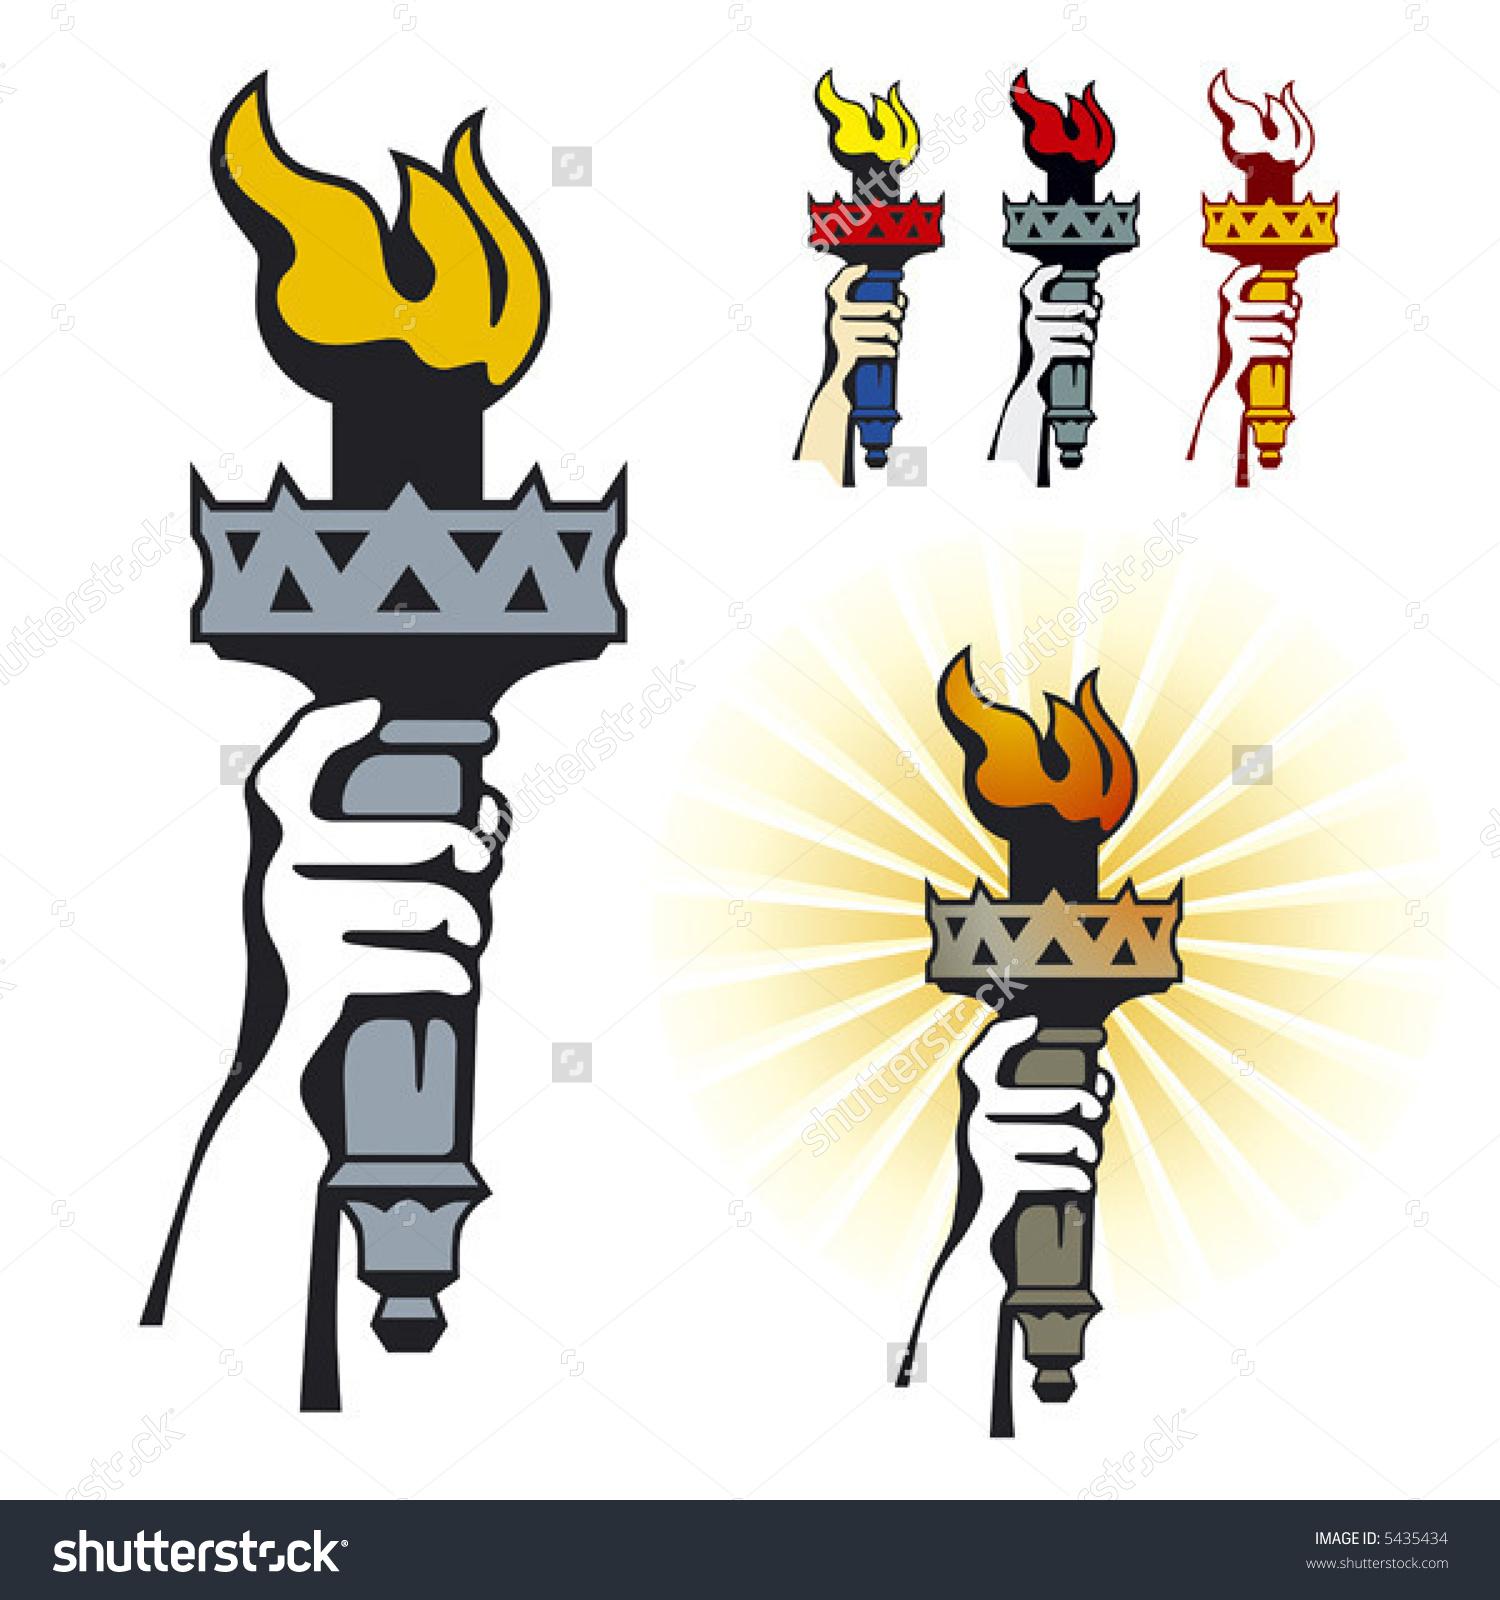 Torch clipart liberty torch Statue Liberty torch Statue liberty